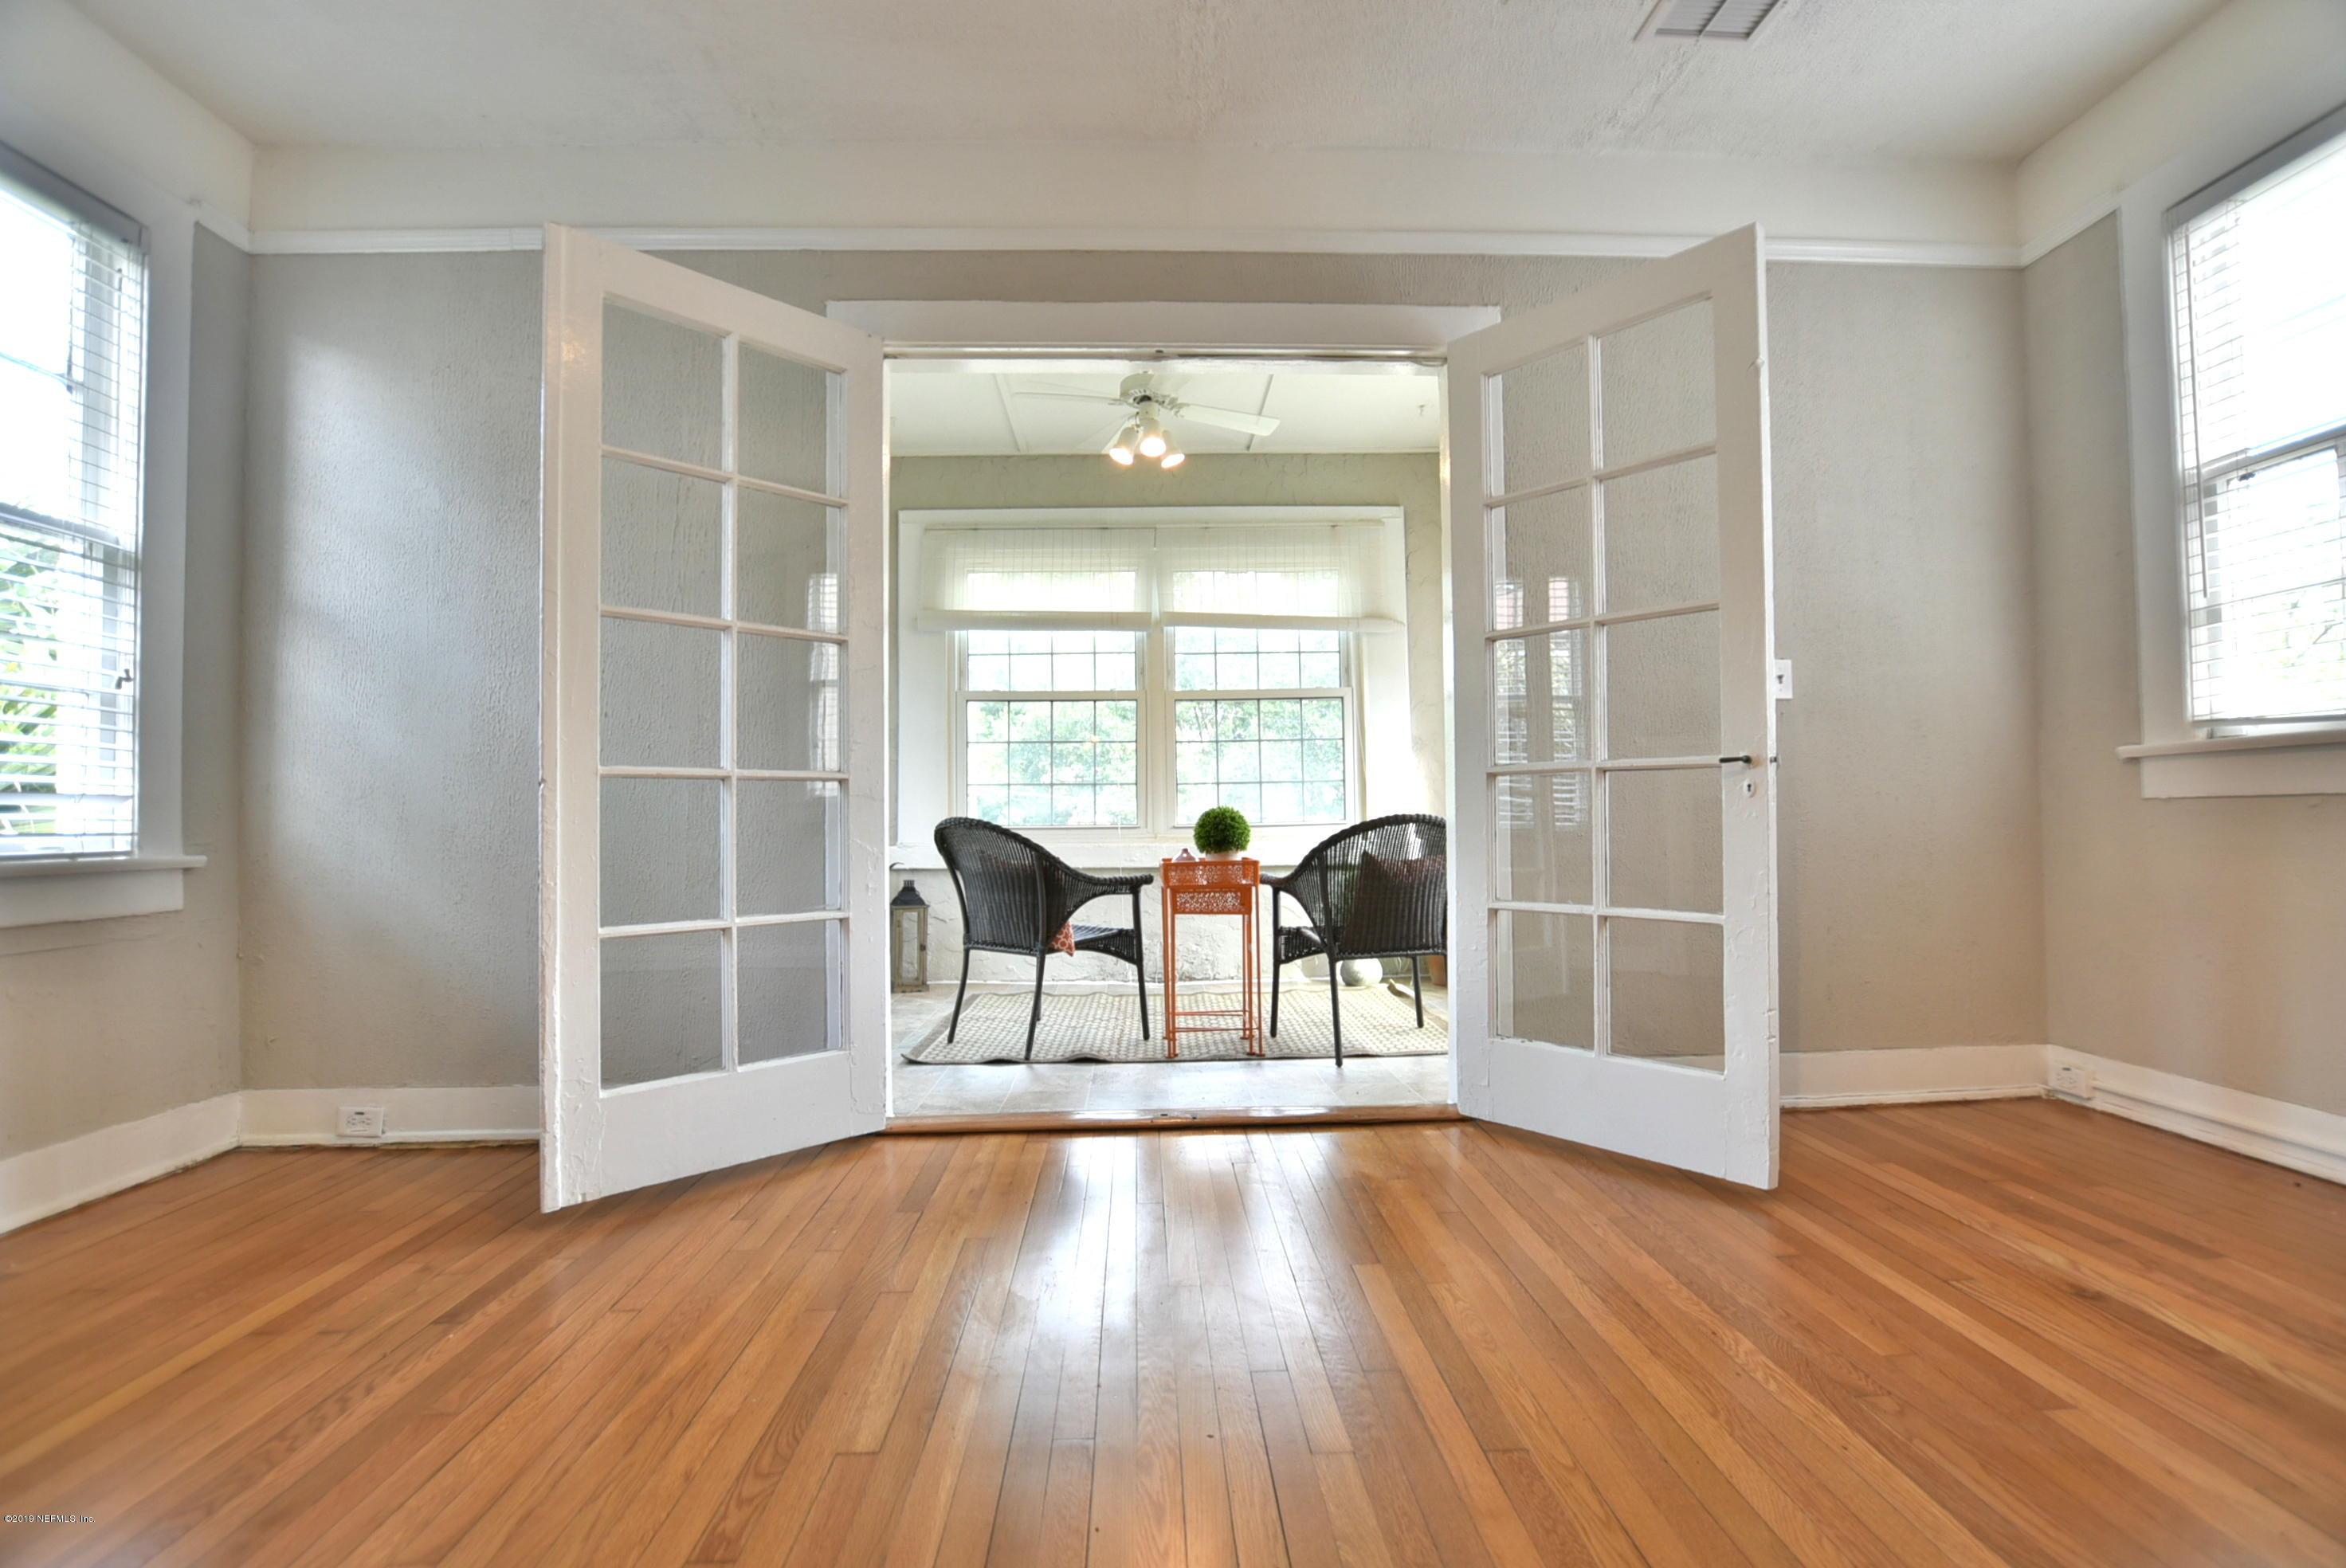 2954 PARK- JACKSONVILLE- FLORIDA 32205, 2 Bedrooms Bedrooms, ,1 BathroomBathrooms,Condo,For sale,PARK,1006684